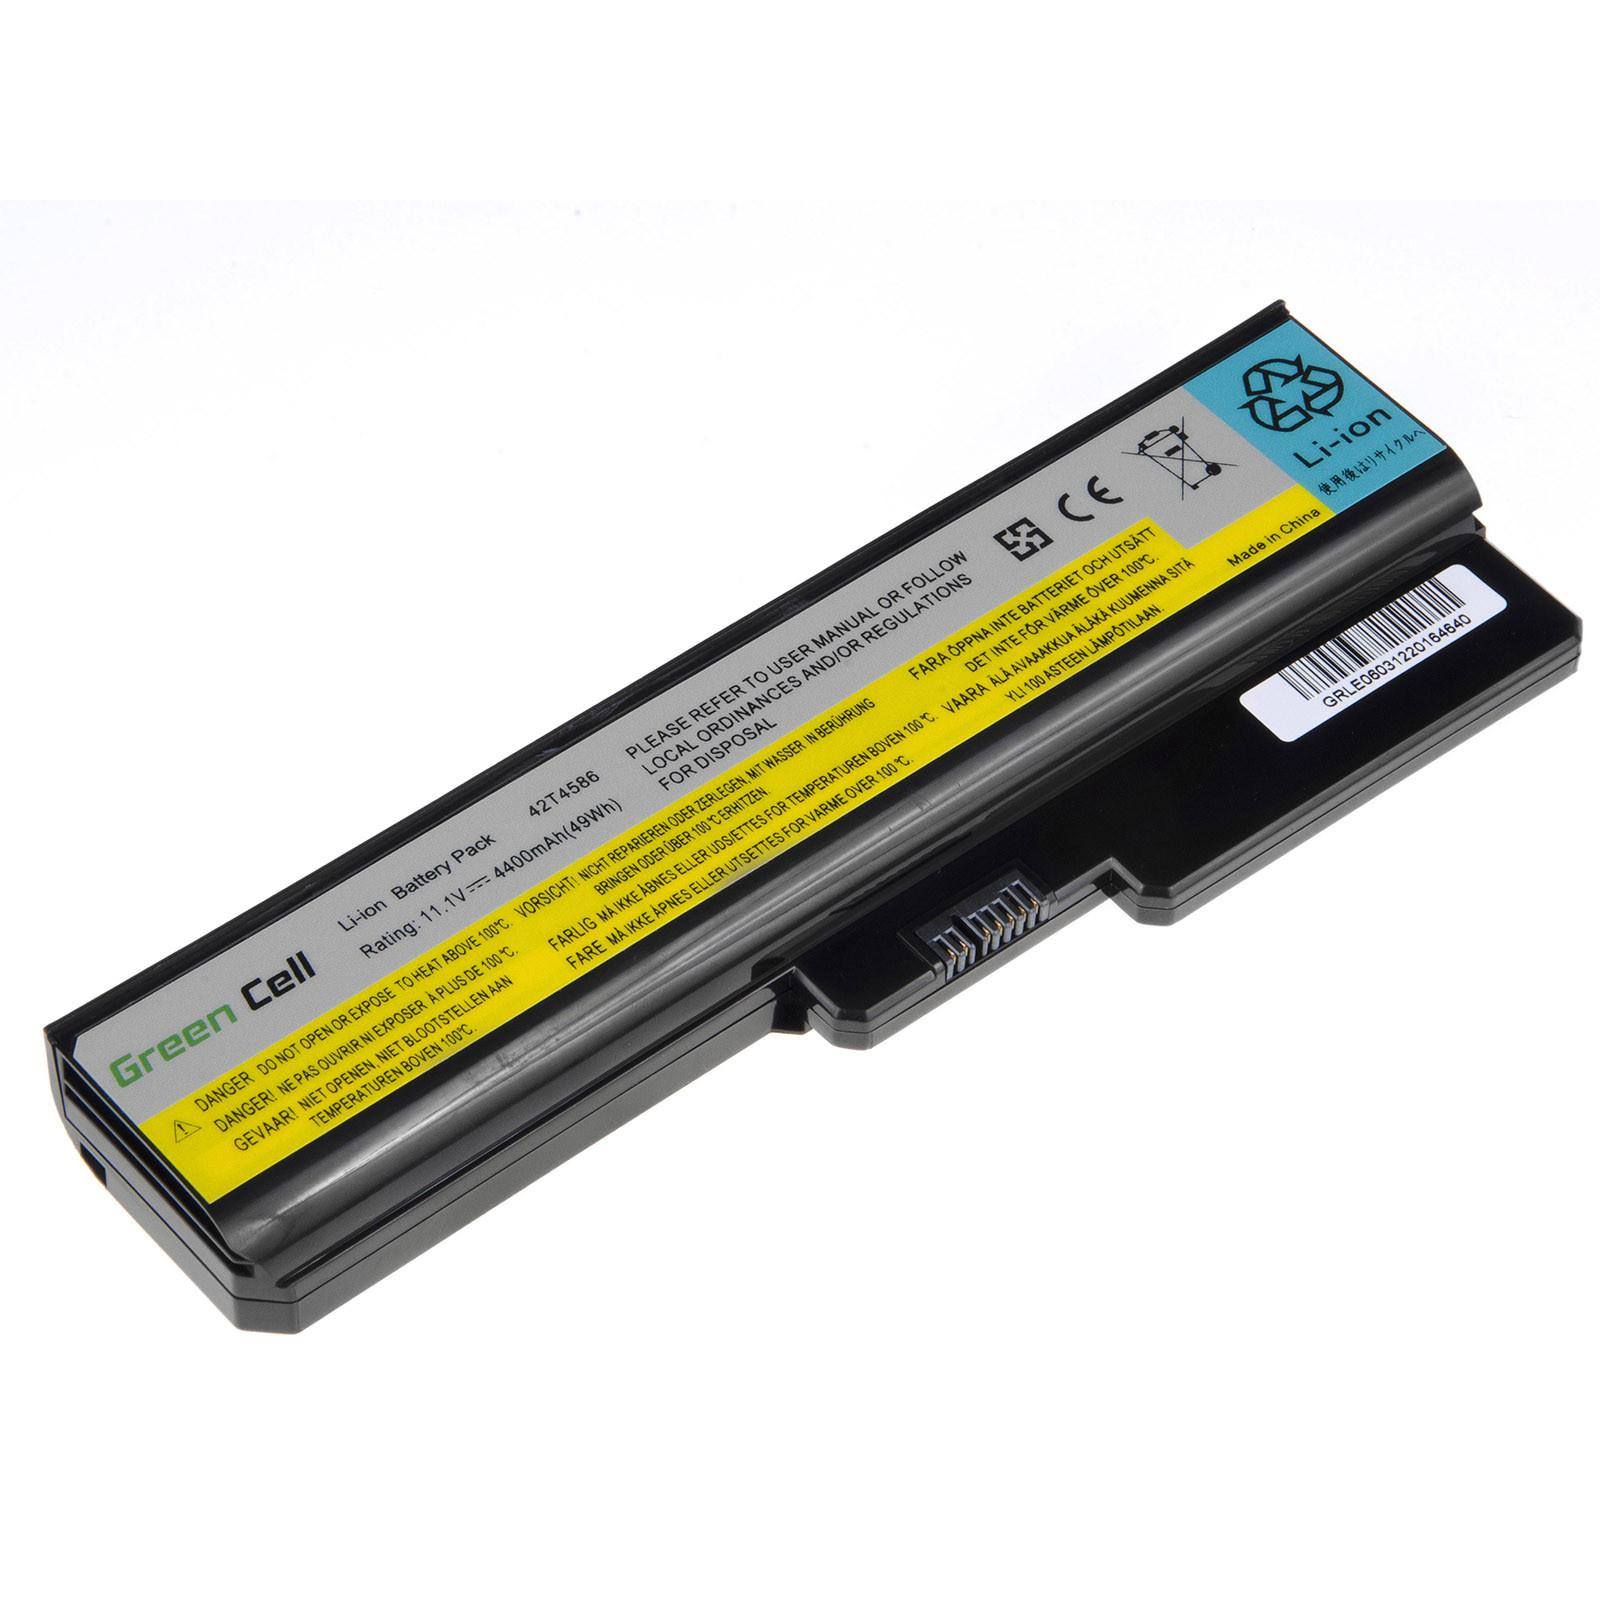 Green Cell Baterie pro Lenovo B550 G430 G450 G530 G550 G550A G555 N500 / 11,1V 4400mAh